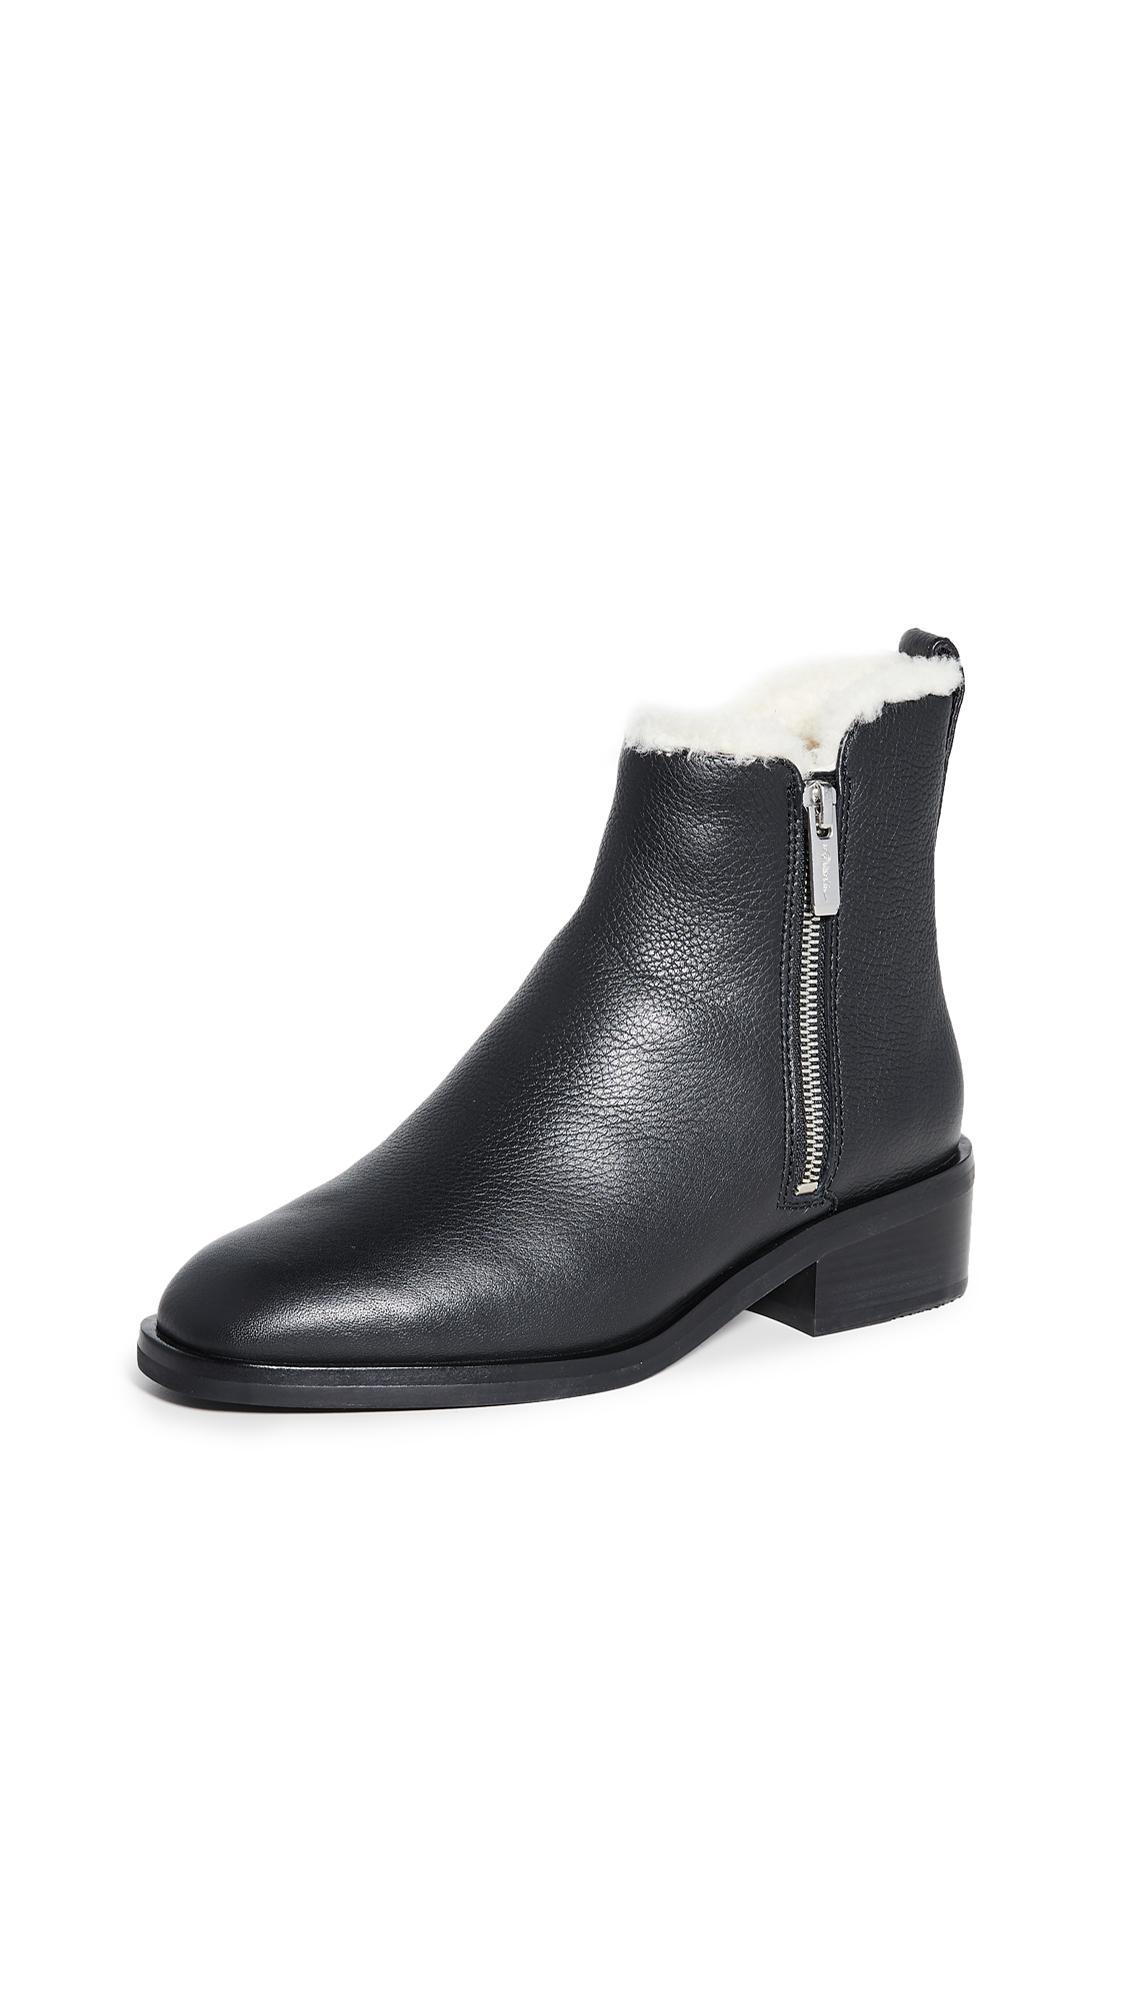 Buy 3.1 Phillip Lim Alexa 40mm Shearling Boots online, shop 3.1 Phillip Lim